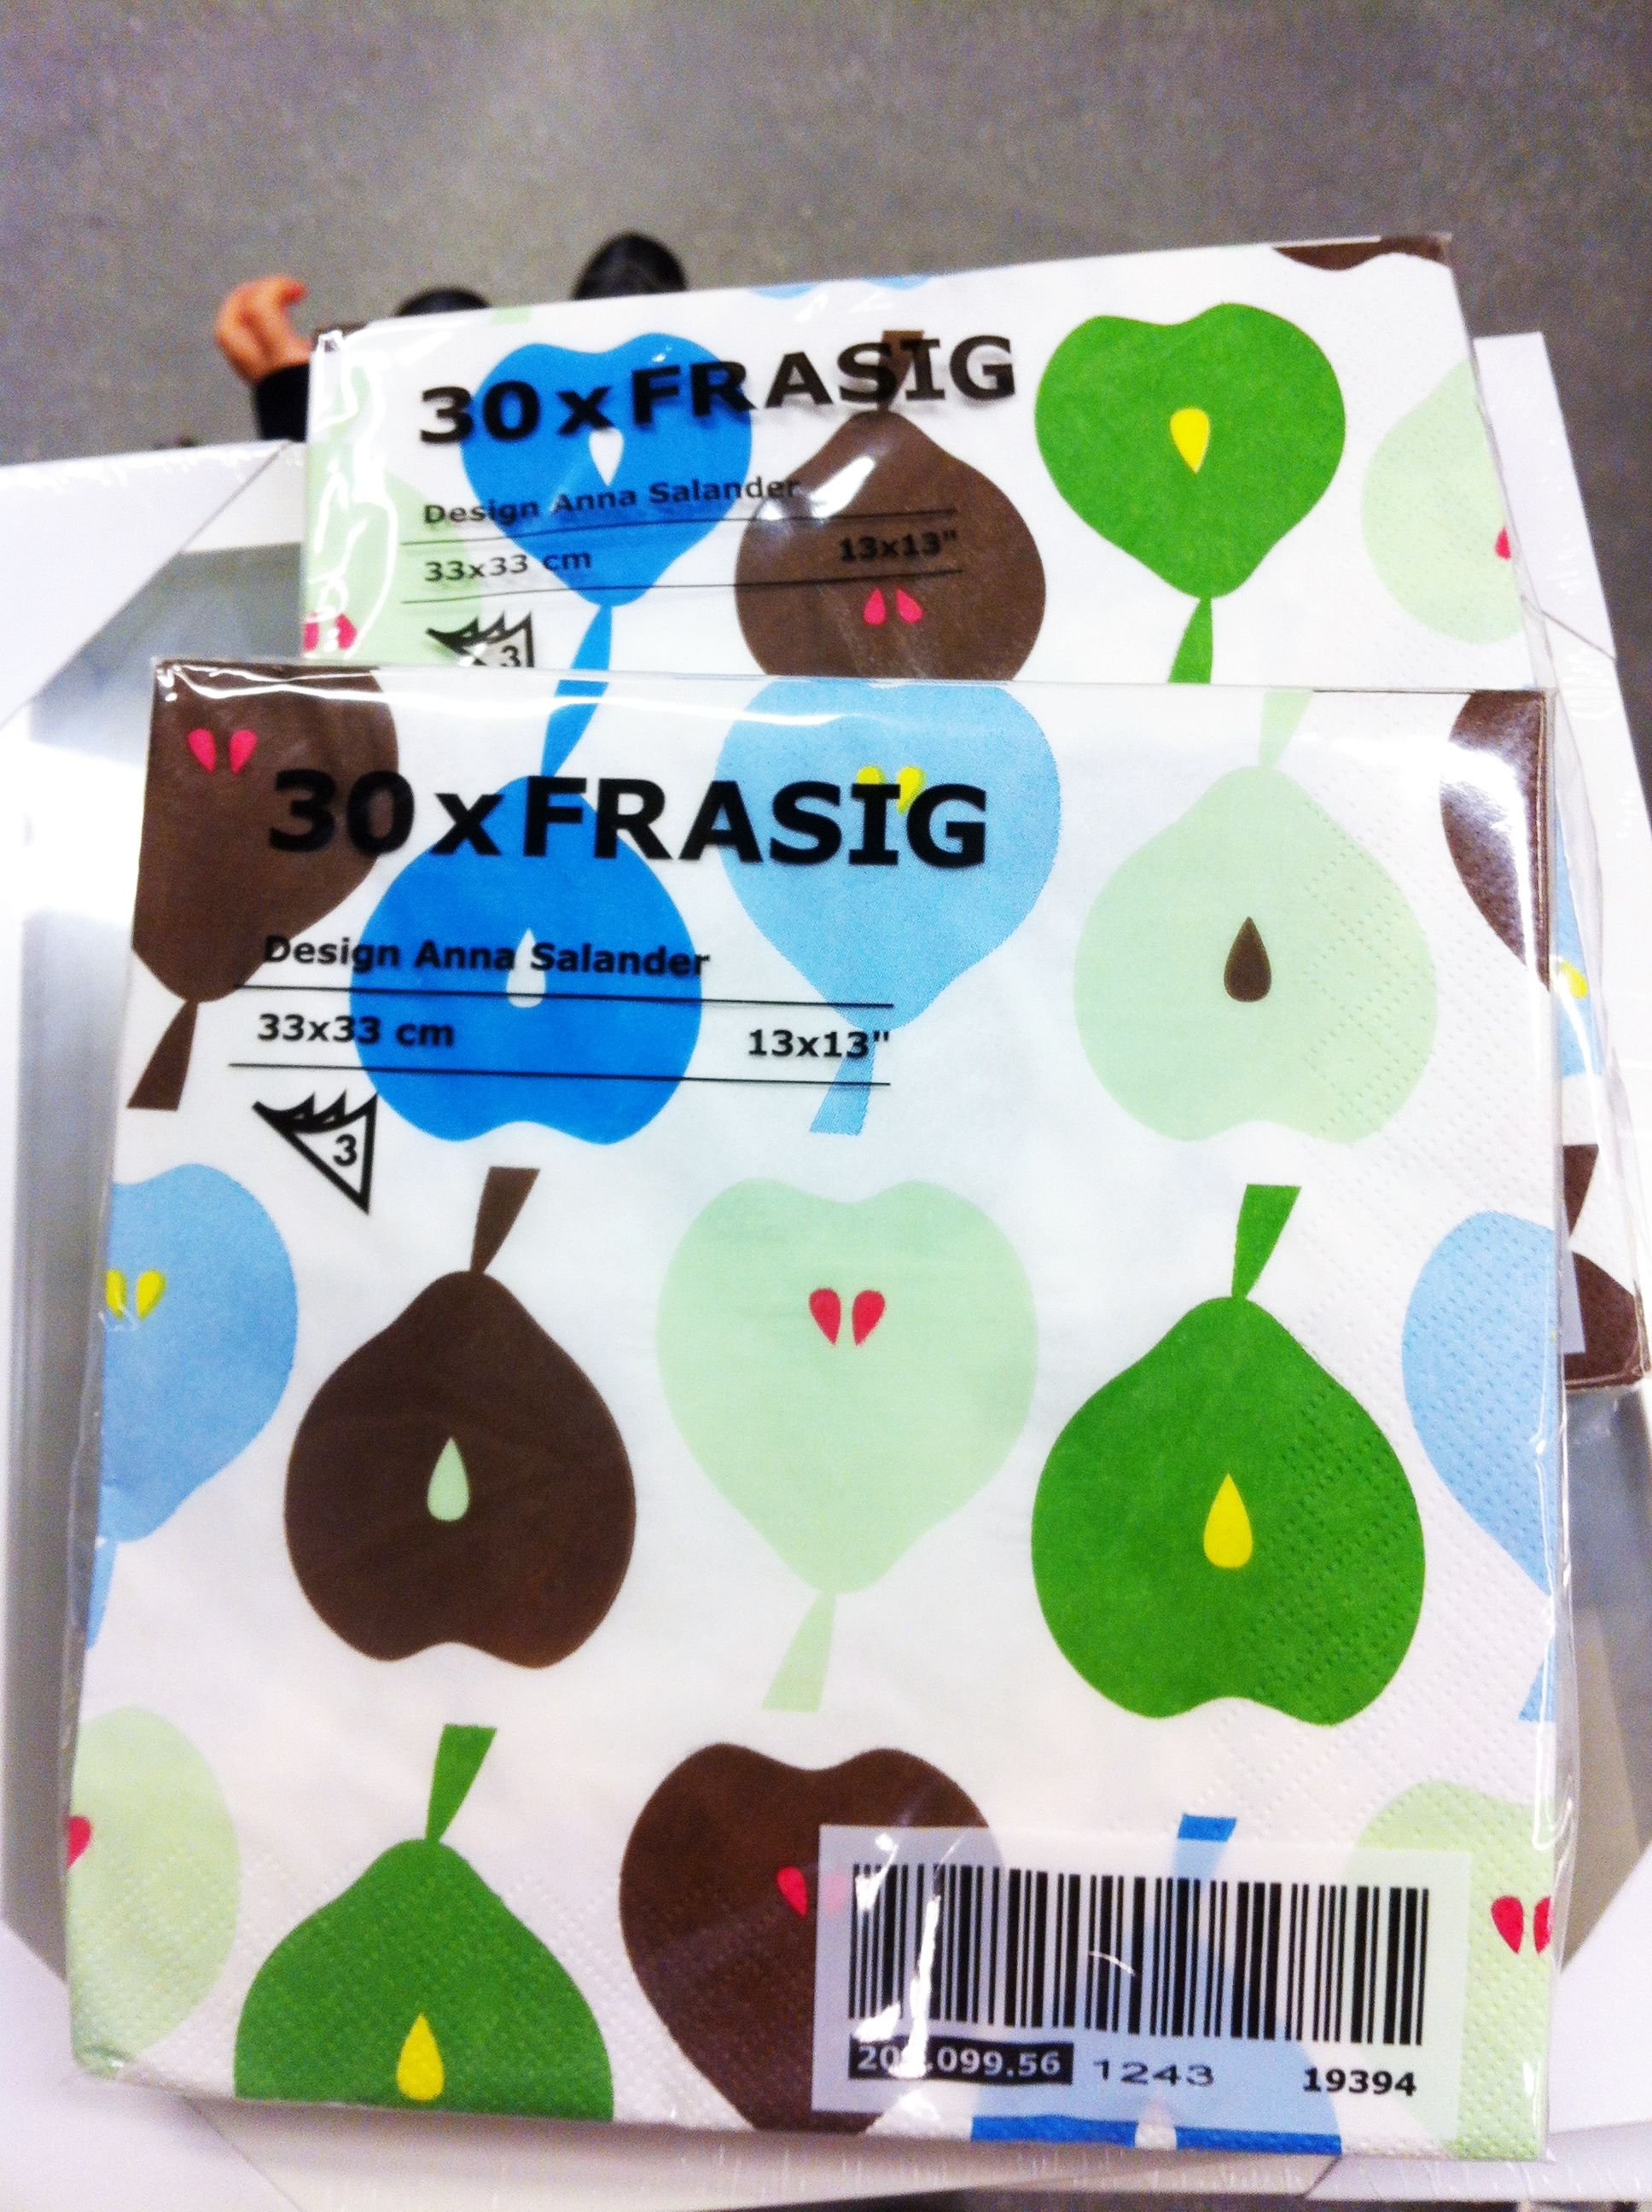 Cute pear napkins IKEA Home Inspiration Pinterest